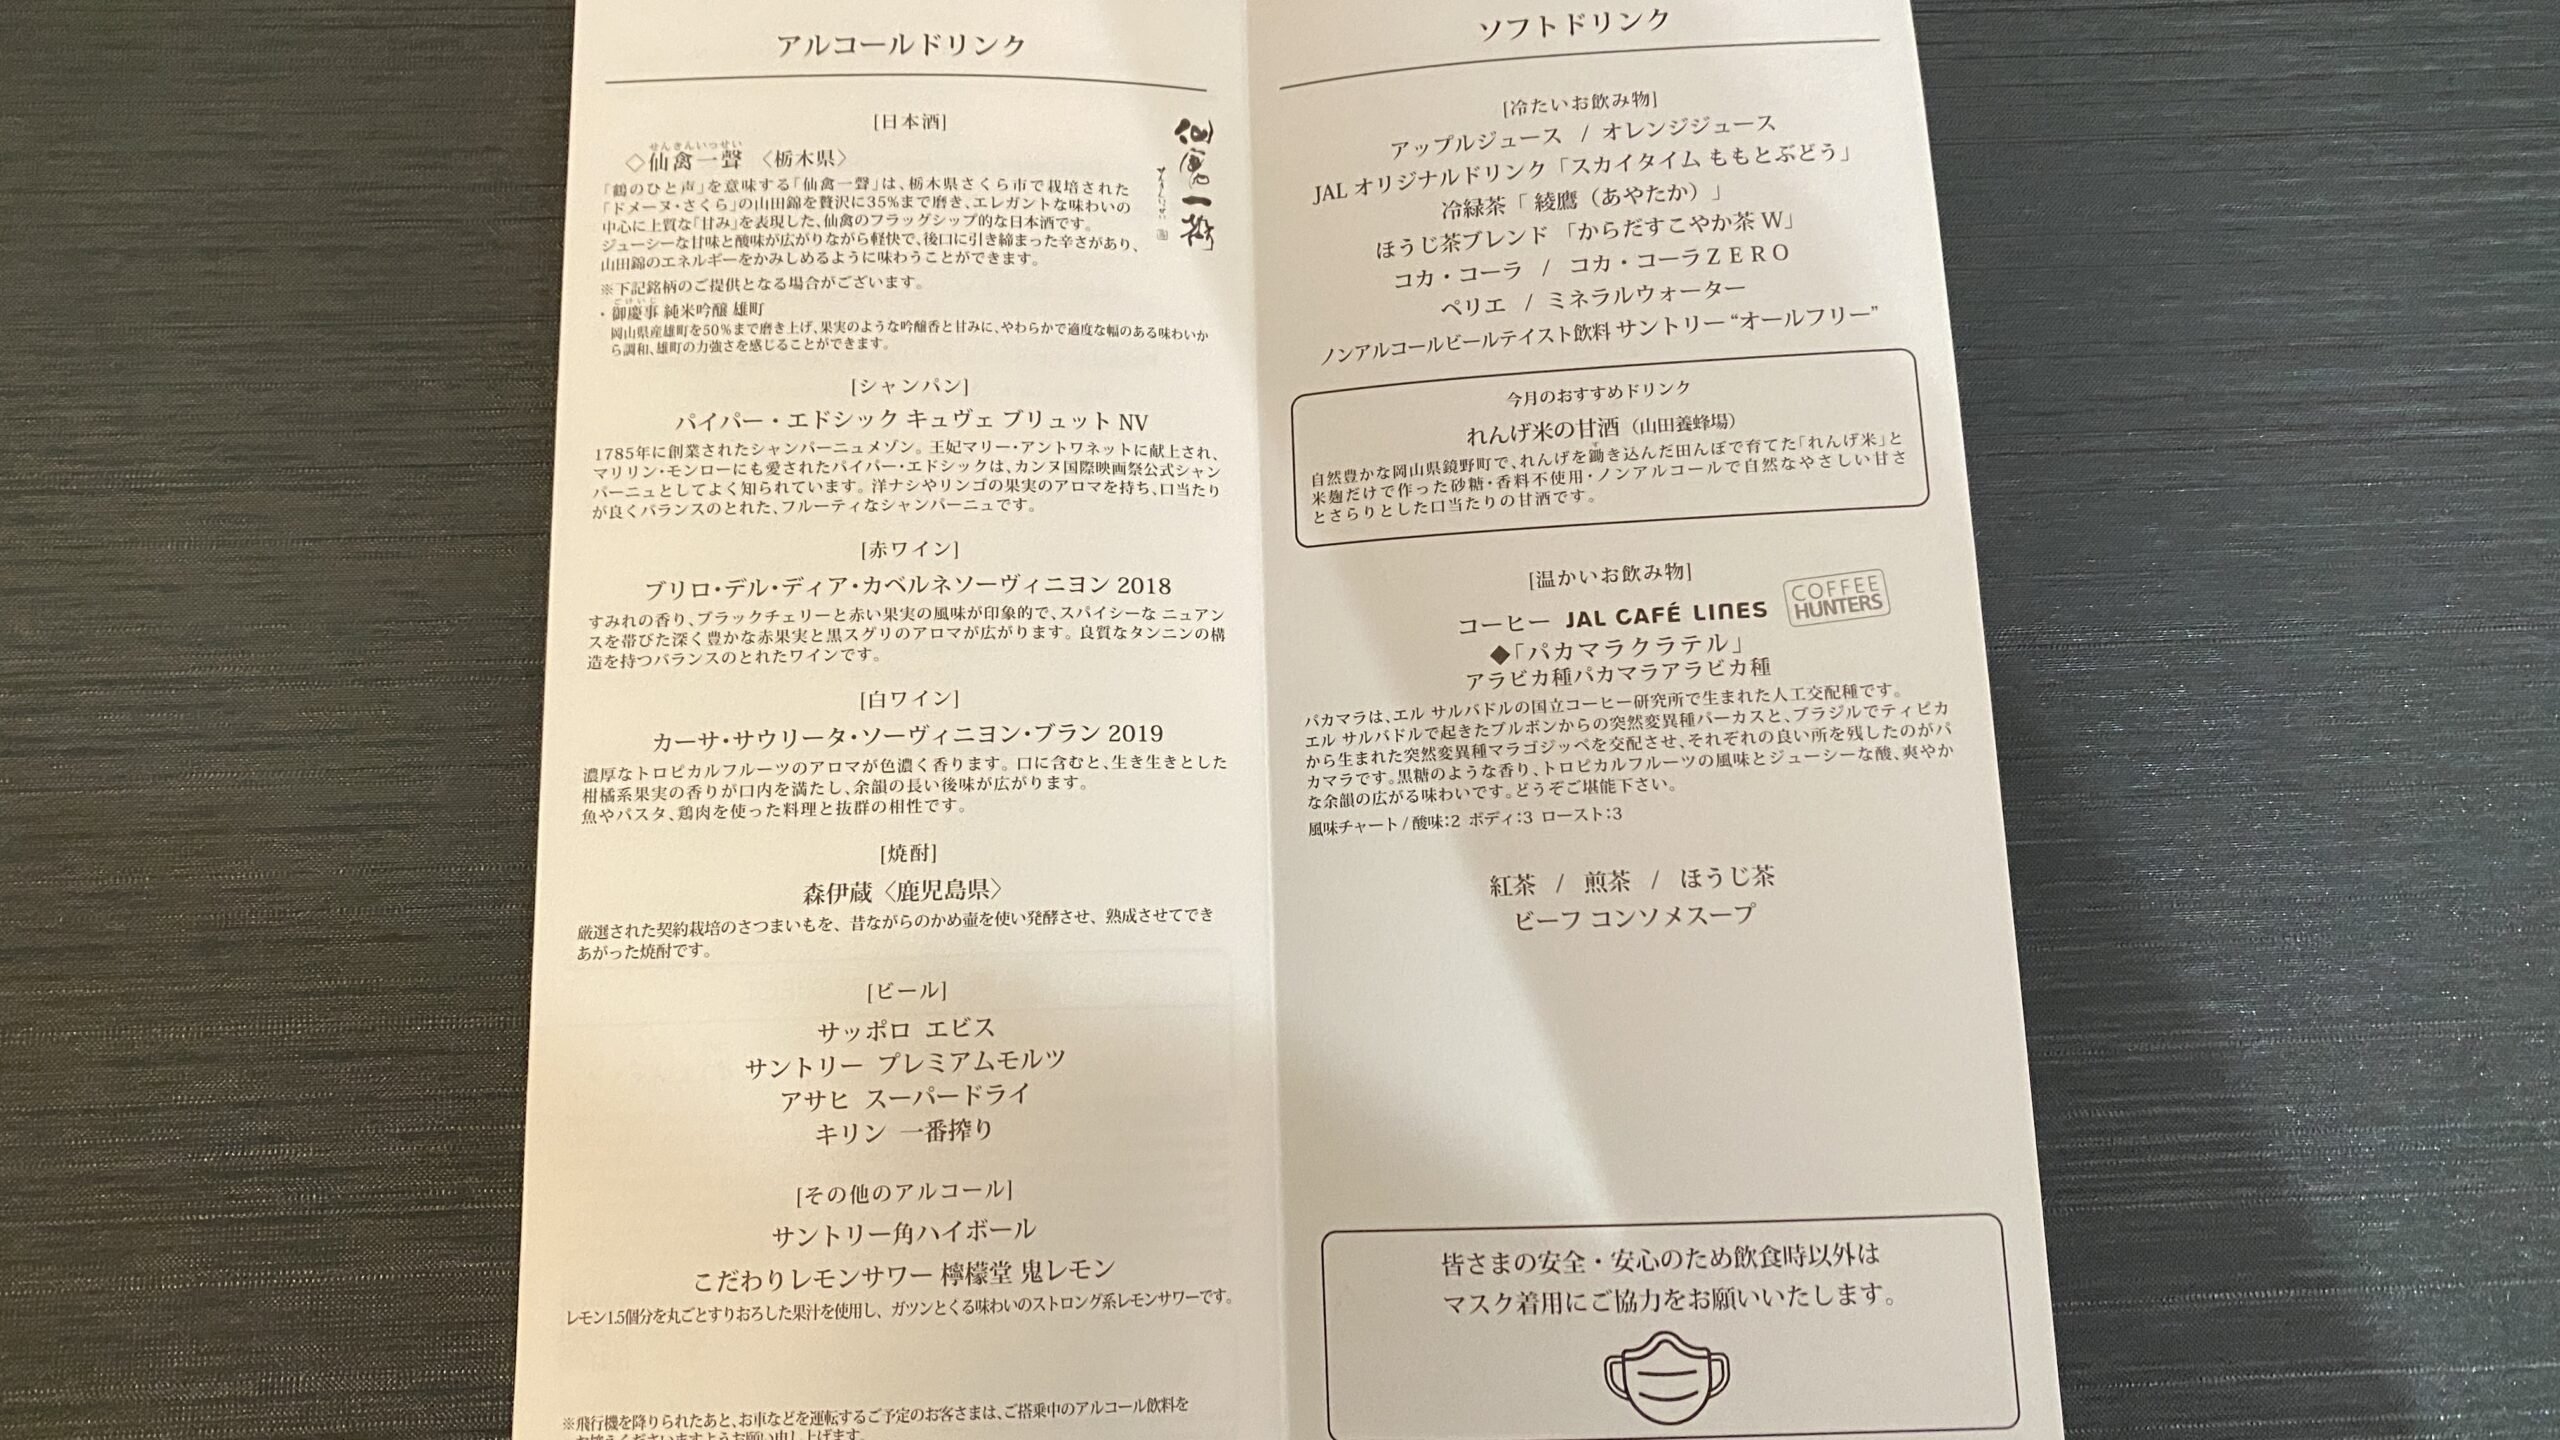 JAL JL914 沖縄(那覇)~羽田 ファーストクラス機内食 09MAR21